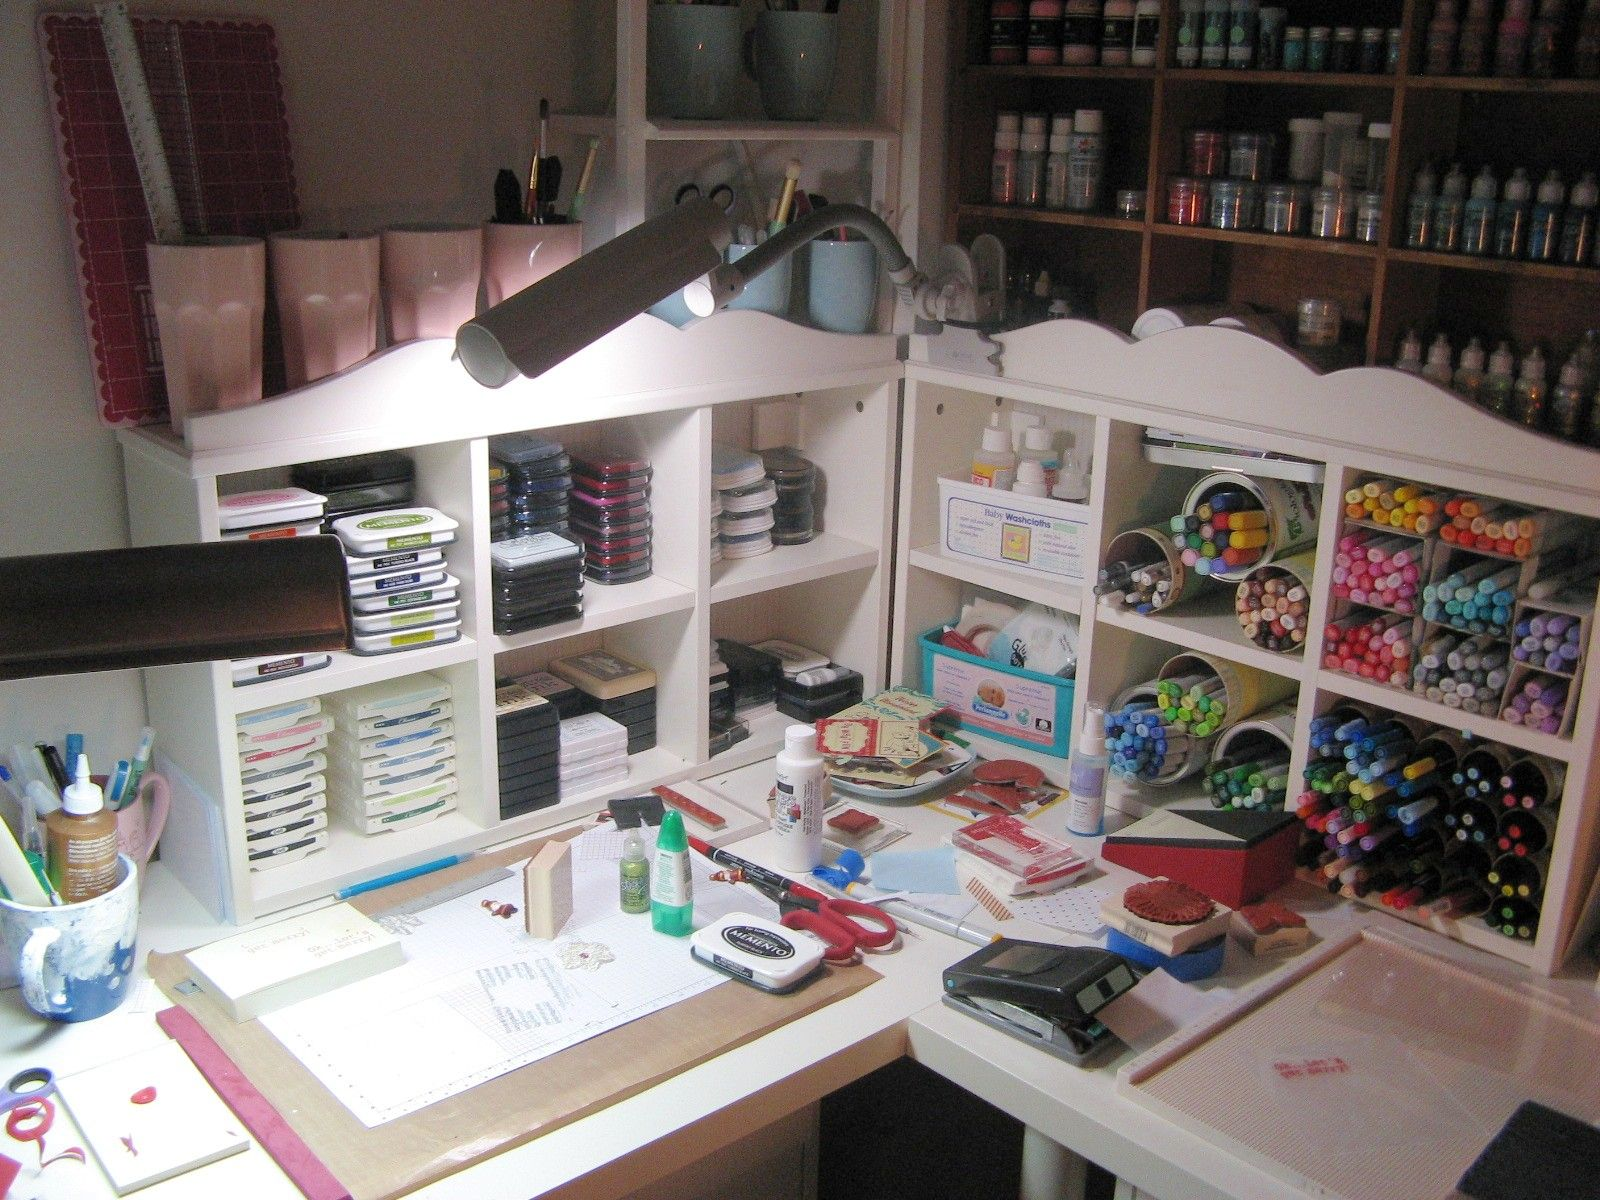 Messy Craft Table Messy Crafts Craft Desk Craft Room Storage